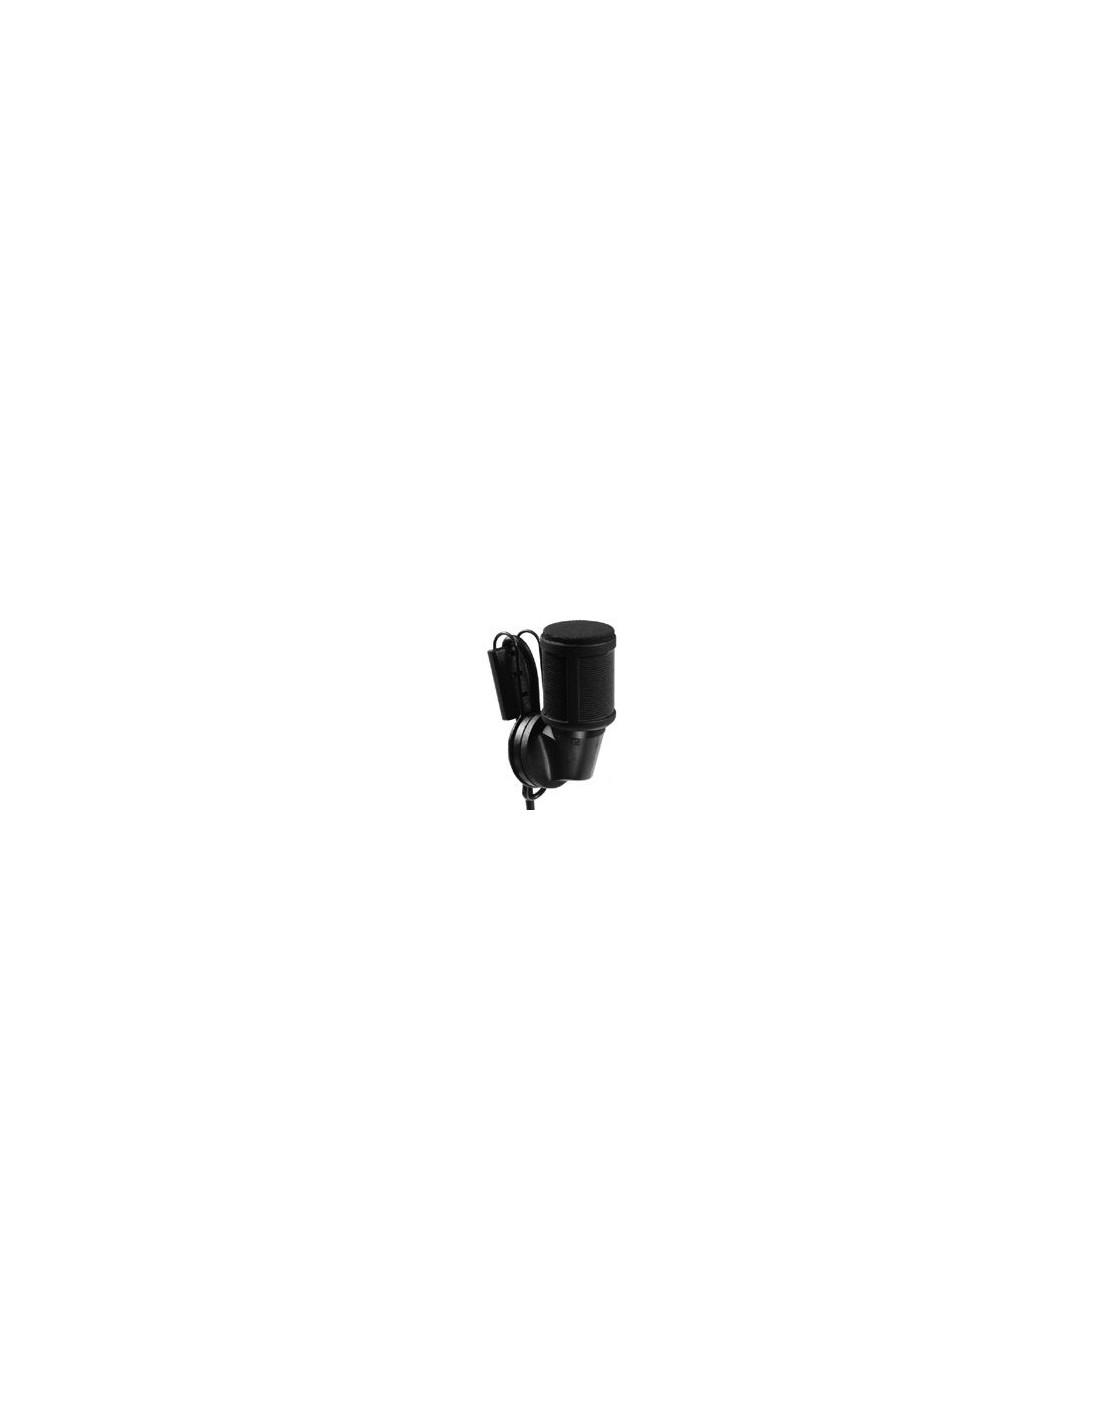 SENNHEISER MKE-40 EW